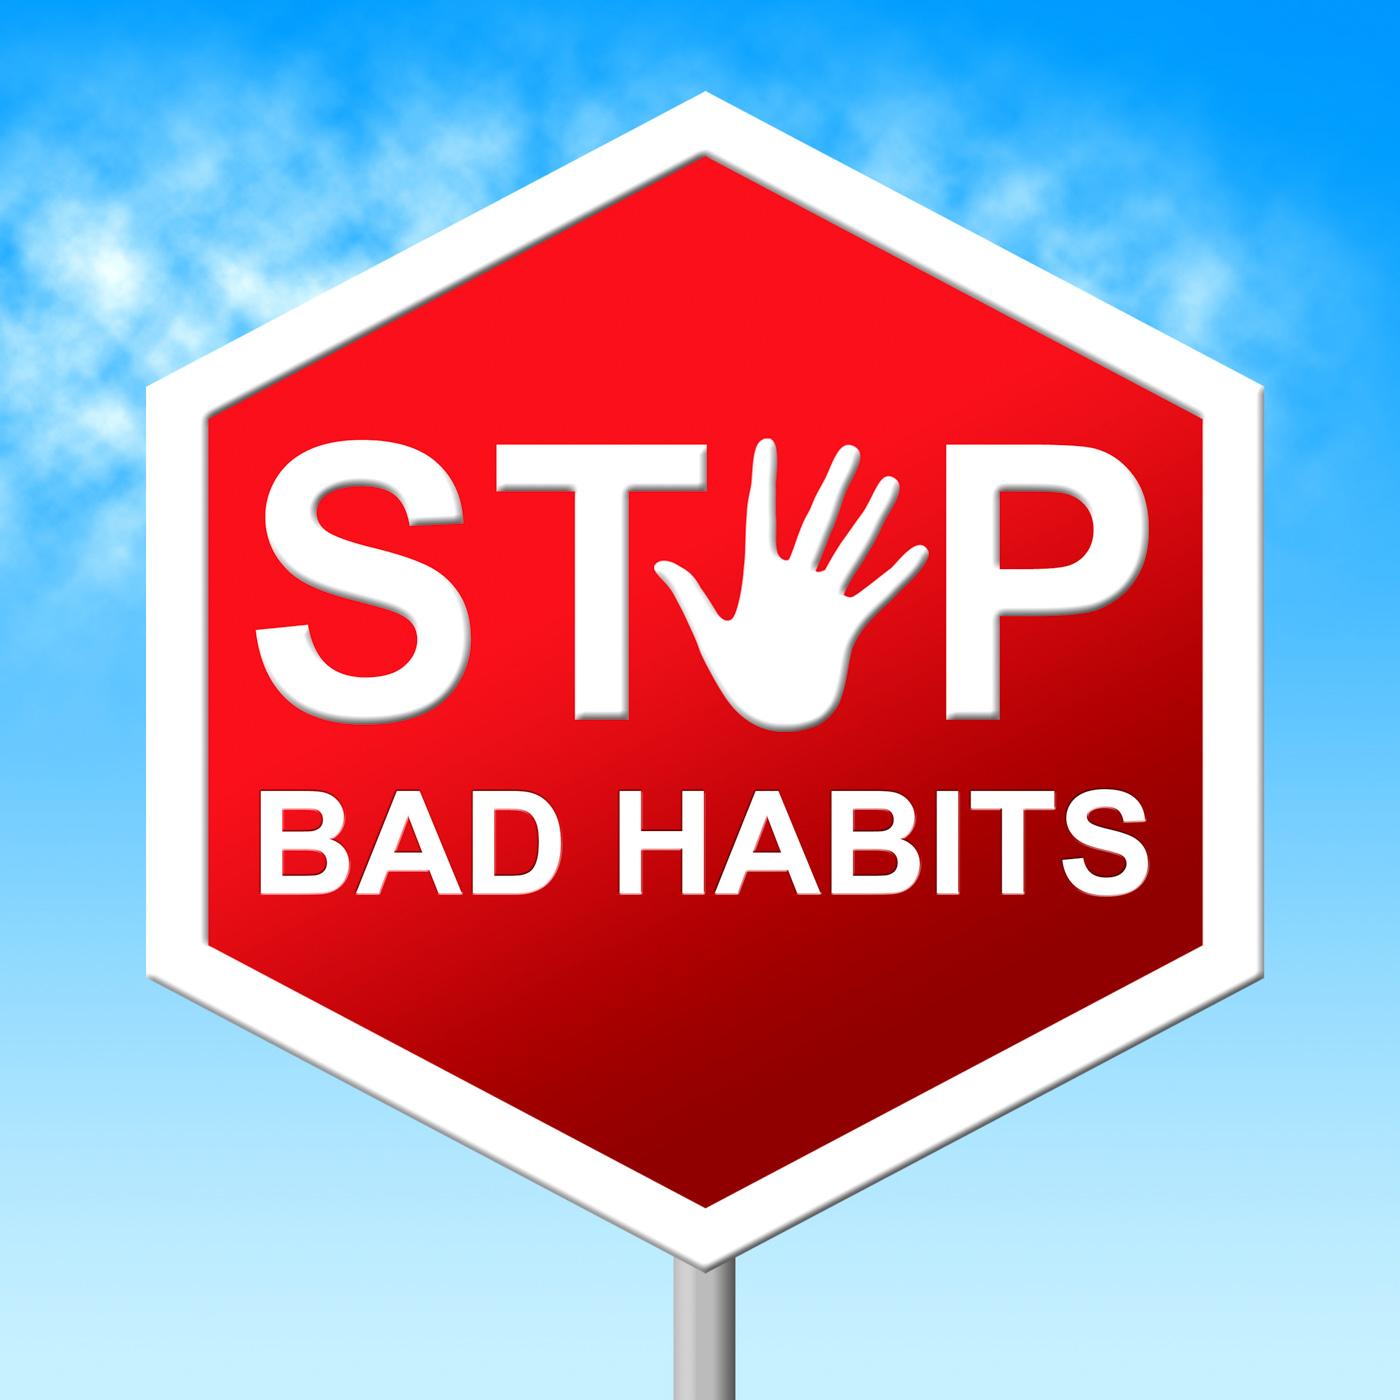 Stop bad habits shows warning sign and danger photo